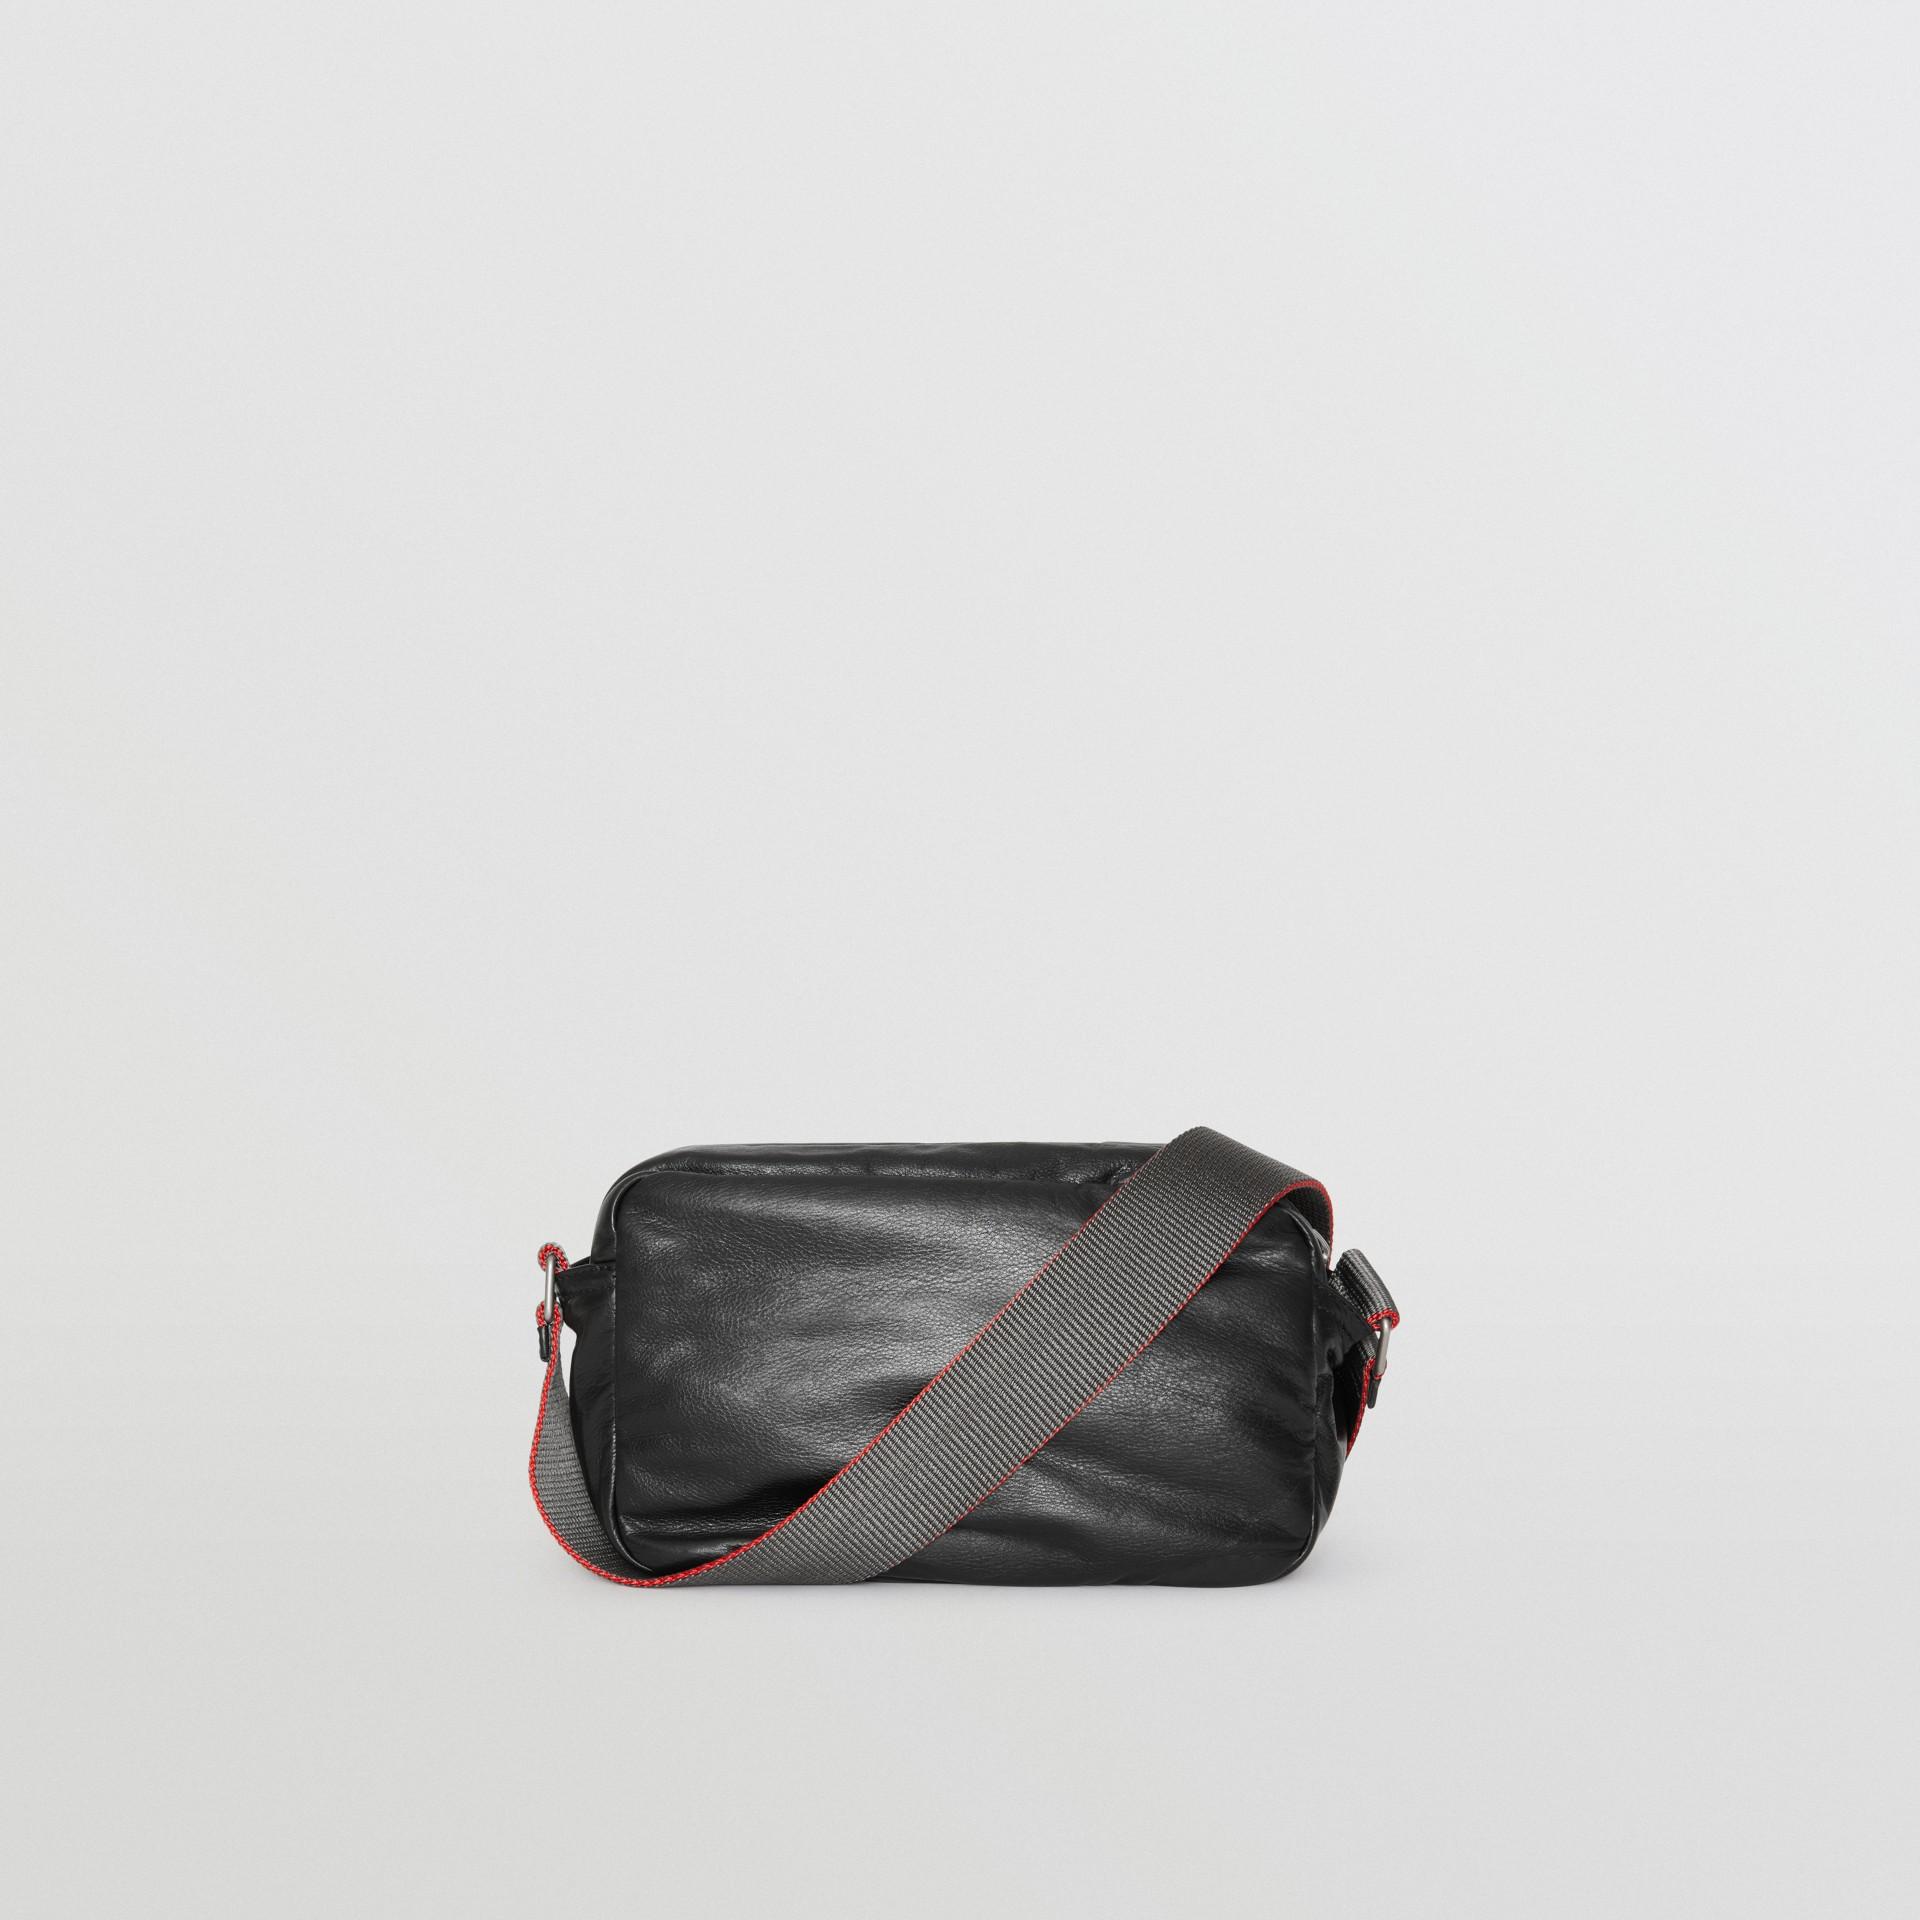 EKD Nappa Leather Crossbody Bag in Black - Men | Burberry Hong Kong - gallery image 5